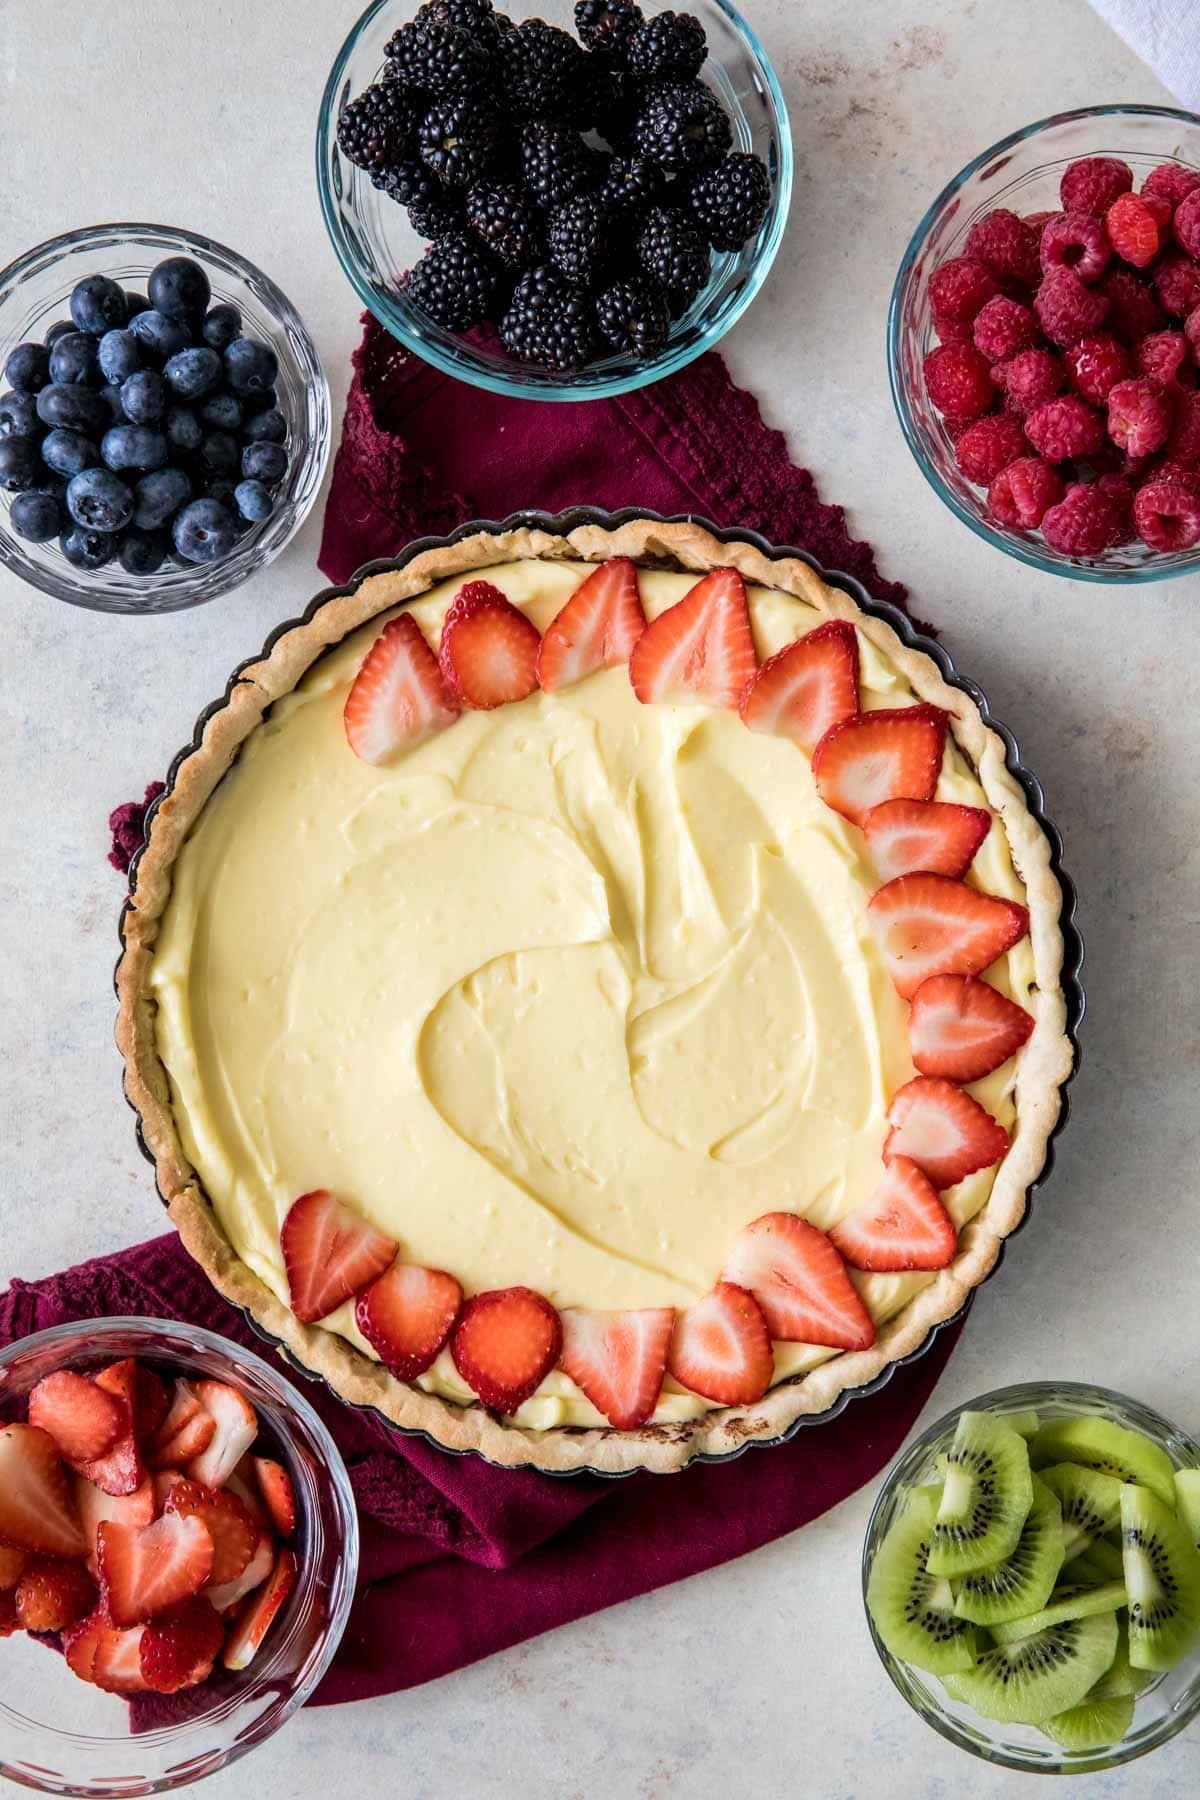 arranging strawberry slices over pastry cream